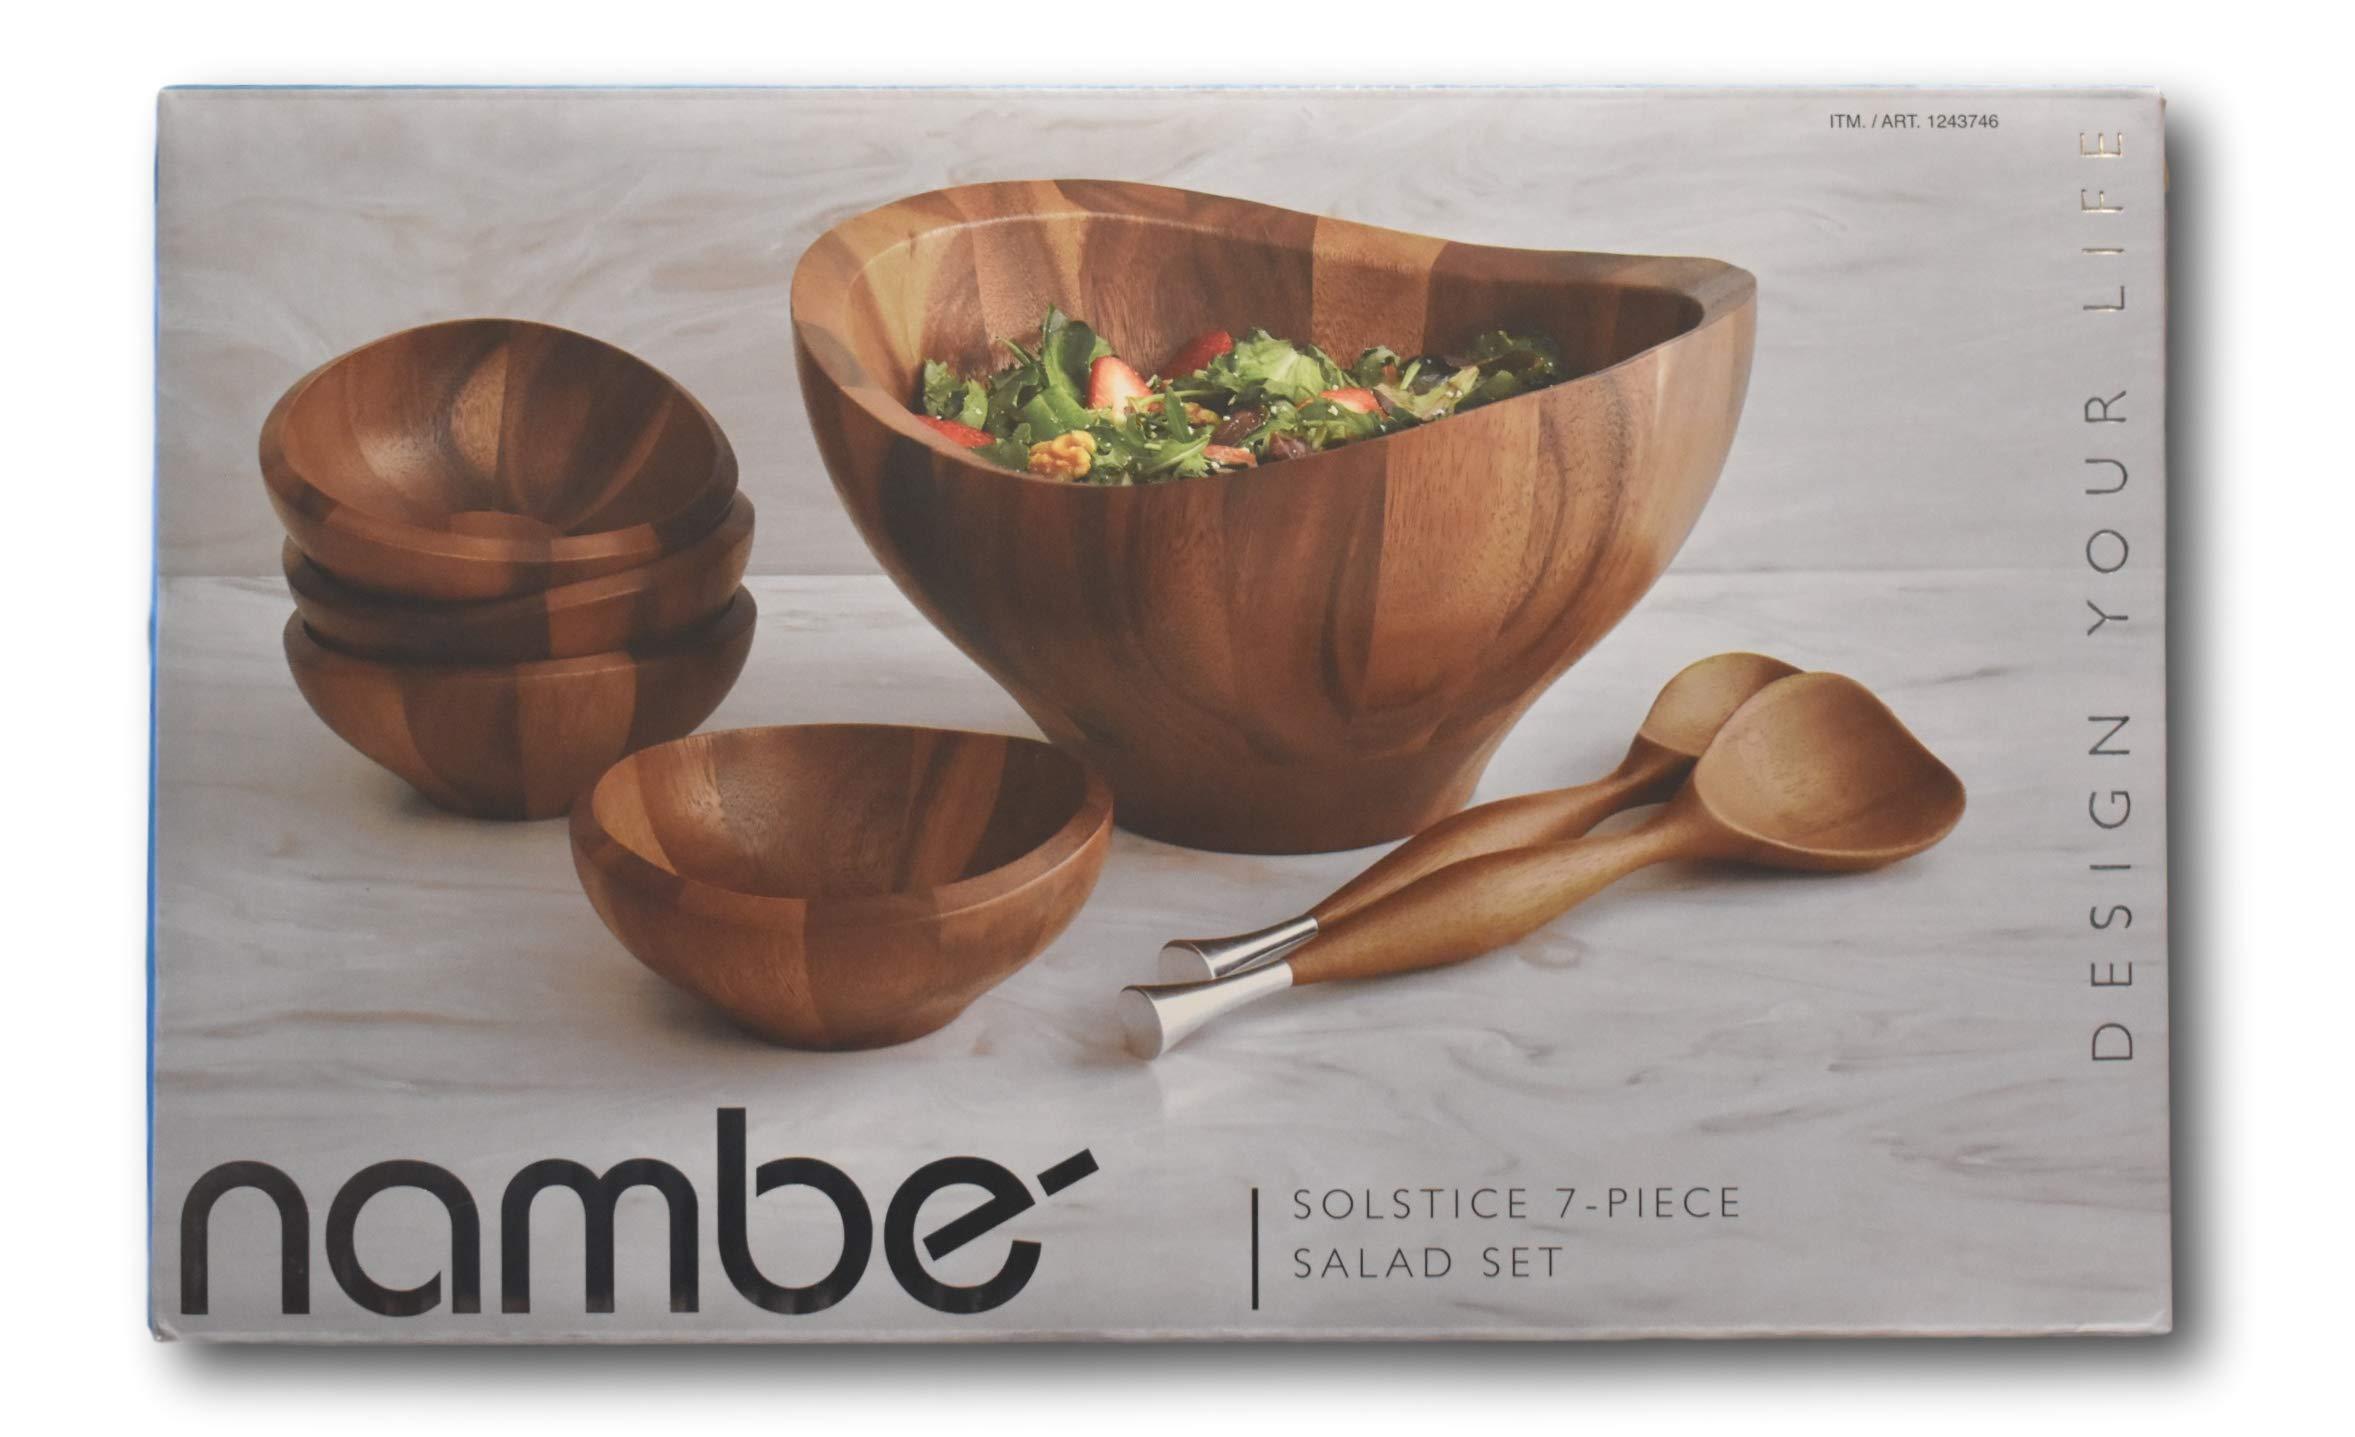 Nambe Solstice 7 Piece Salad Set- Made From Premium Acacia Wood